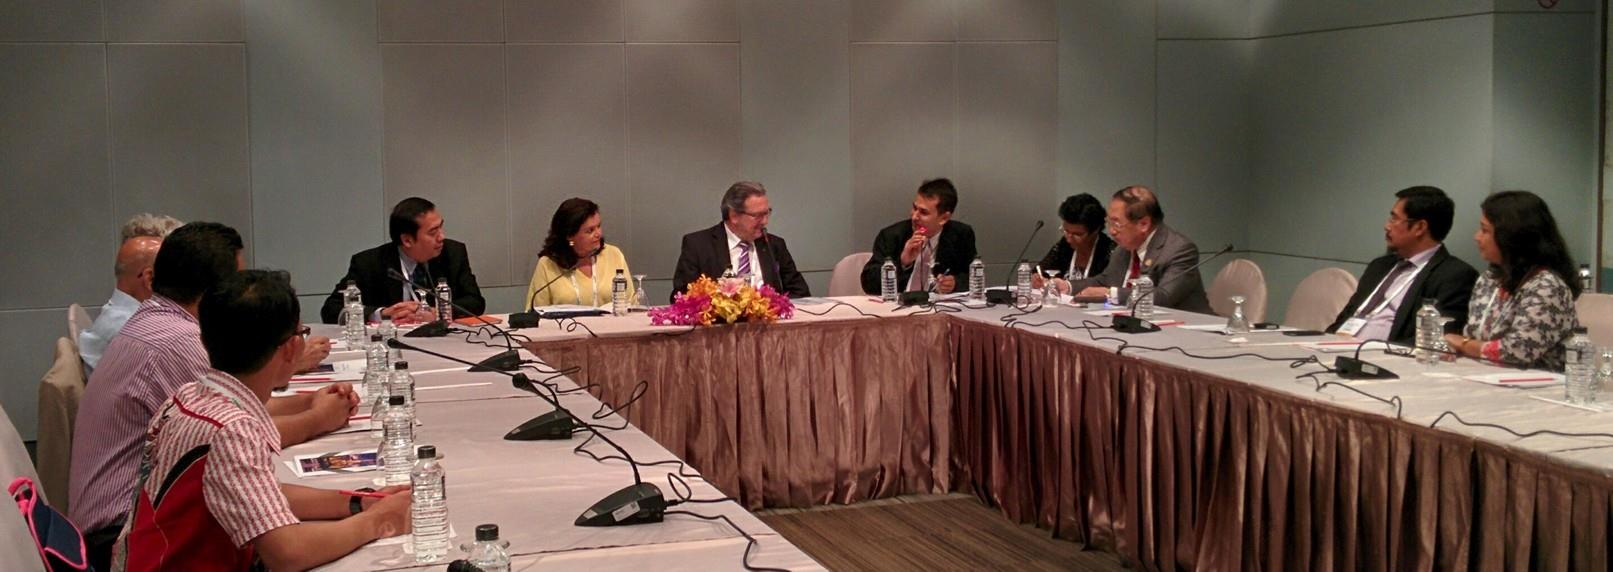 SEARPharm Forum Council Meeting